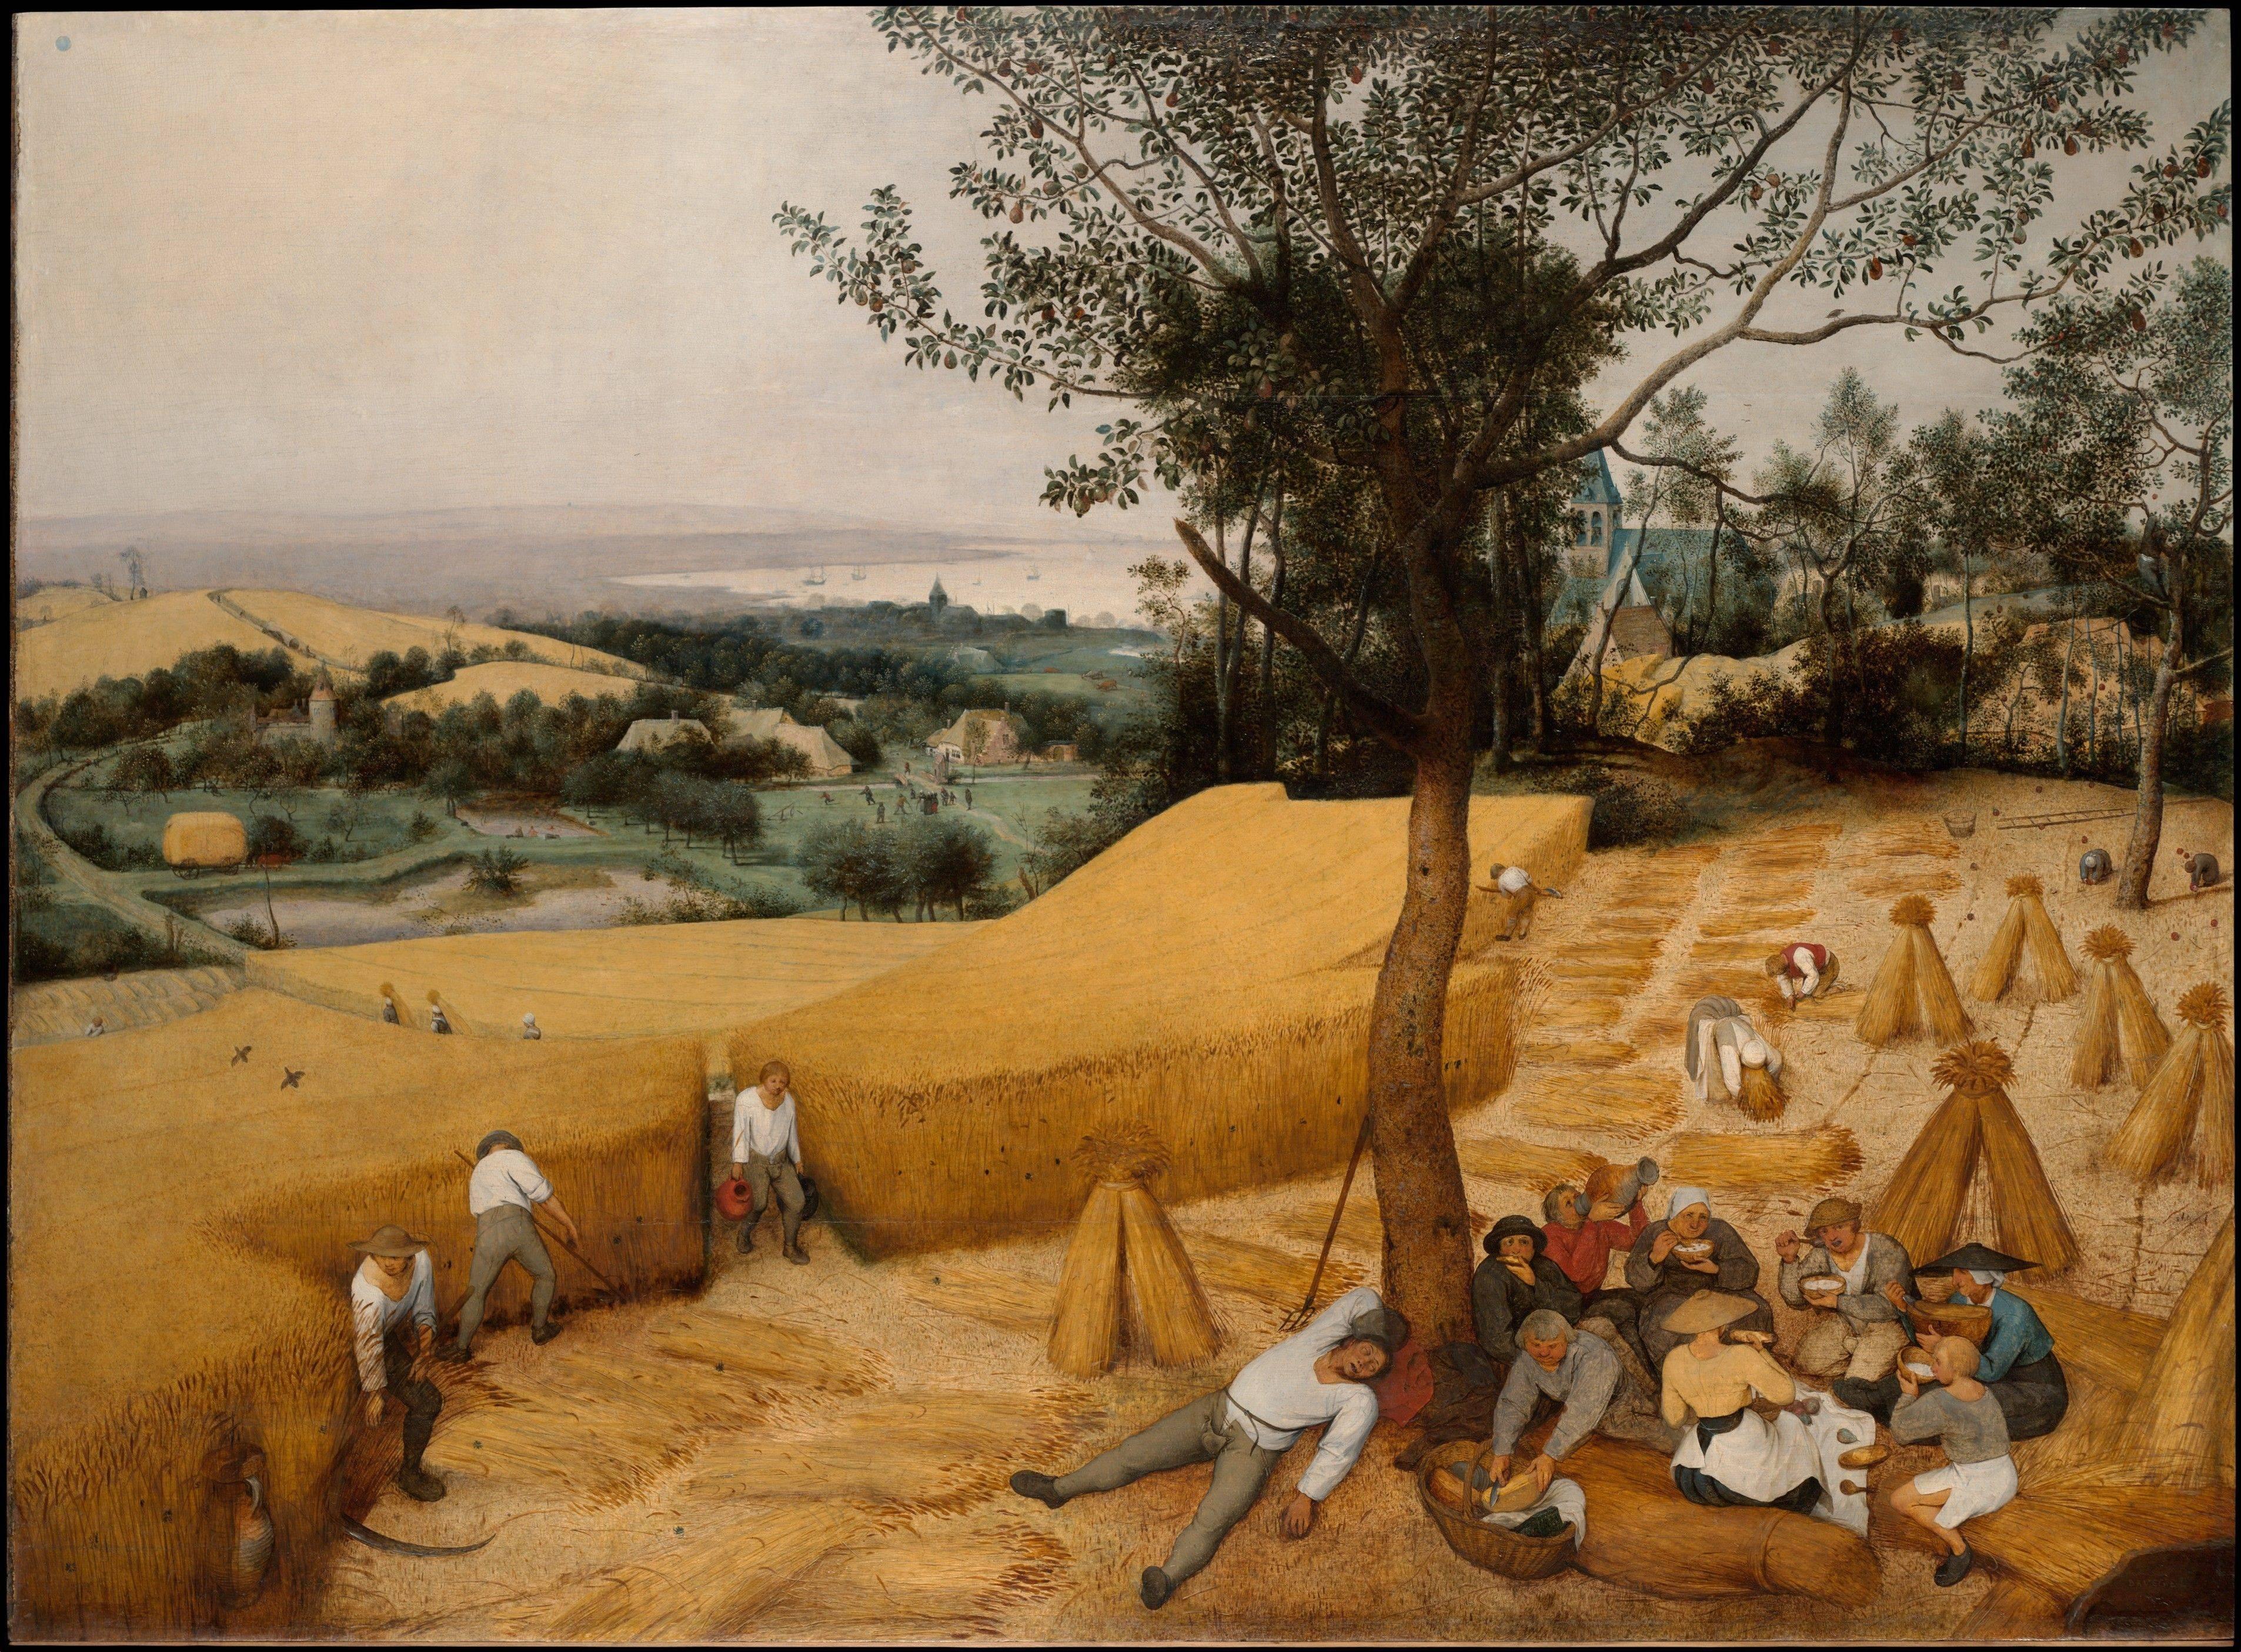 Abb. 4: Pieter Bruegel der Ältere: Die Kornernte (August/September), 1565, Öl auf Holz, 119 x 162 cm, New York, Metropolitan Museum of Art, Foto: Museum.